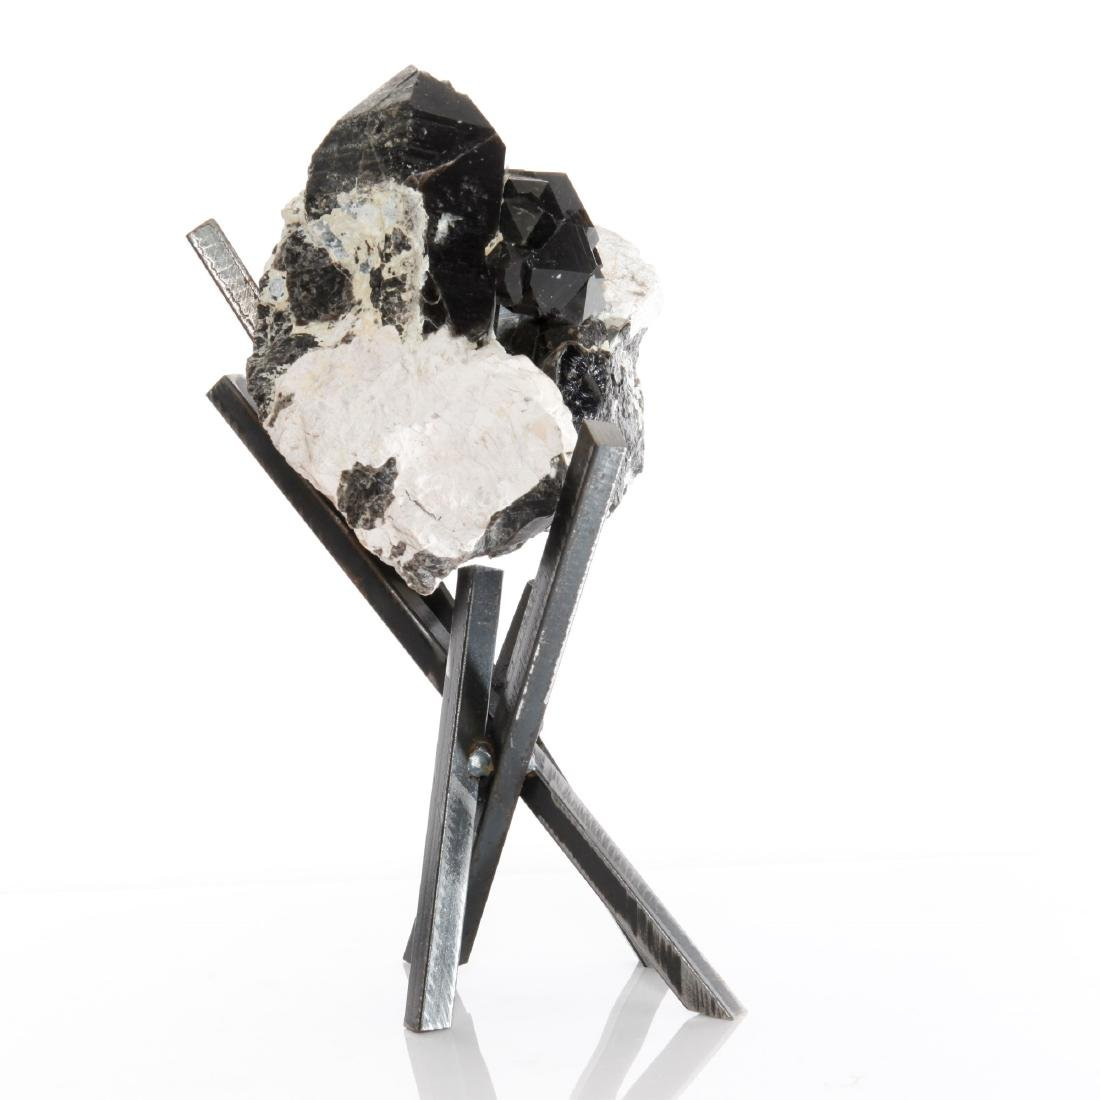 Tibetan Black Quartz Crystal Cluster on Metal Base